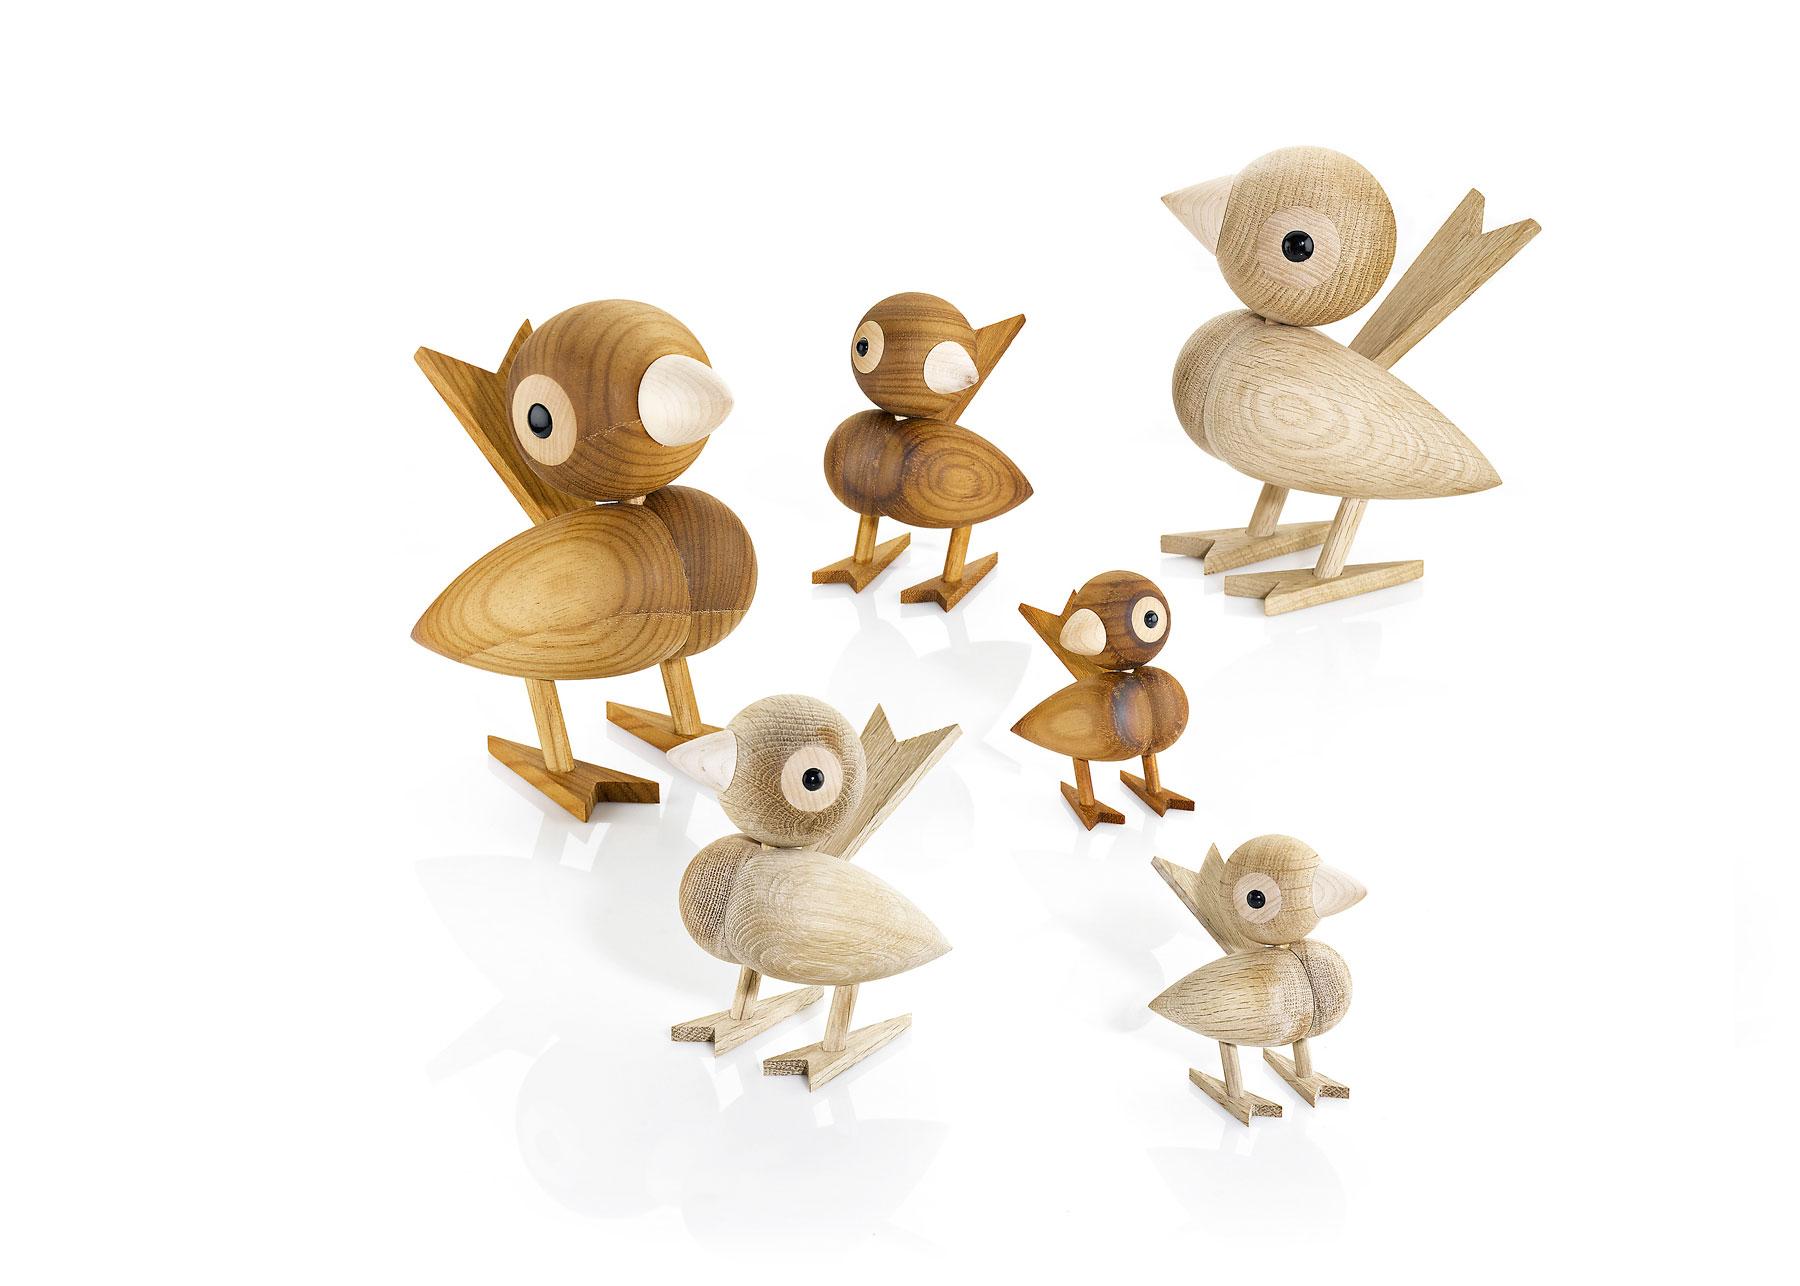 Moineaux-sparrow-gunnar-florning-02